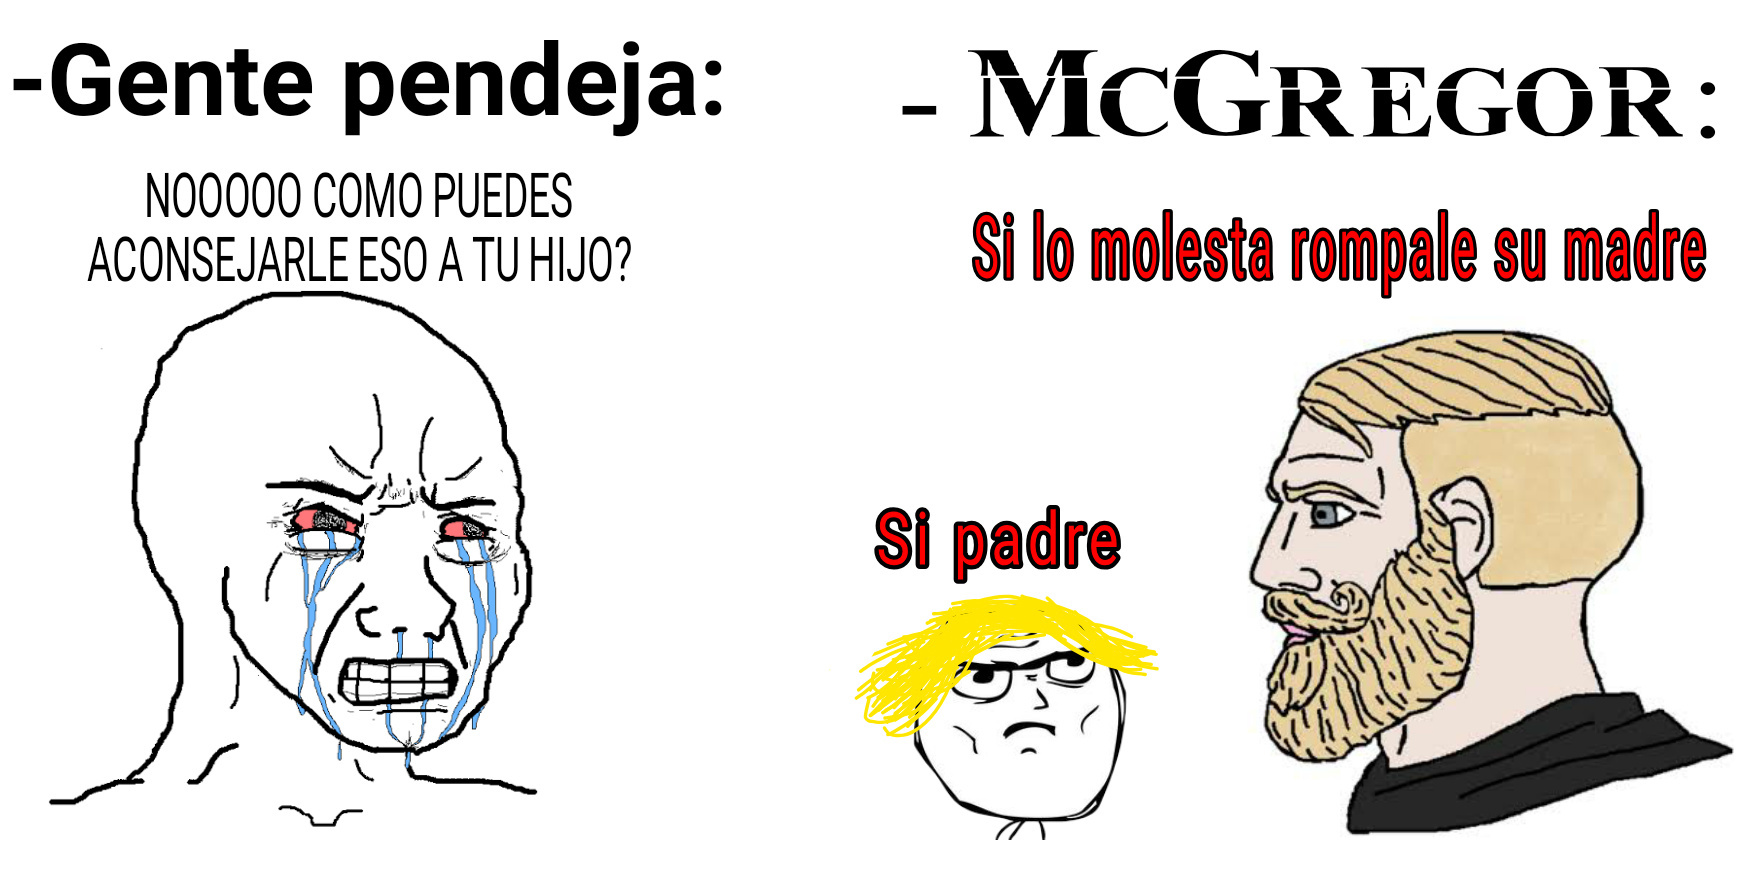 GRANDE MCGREGOR - meme